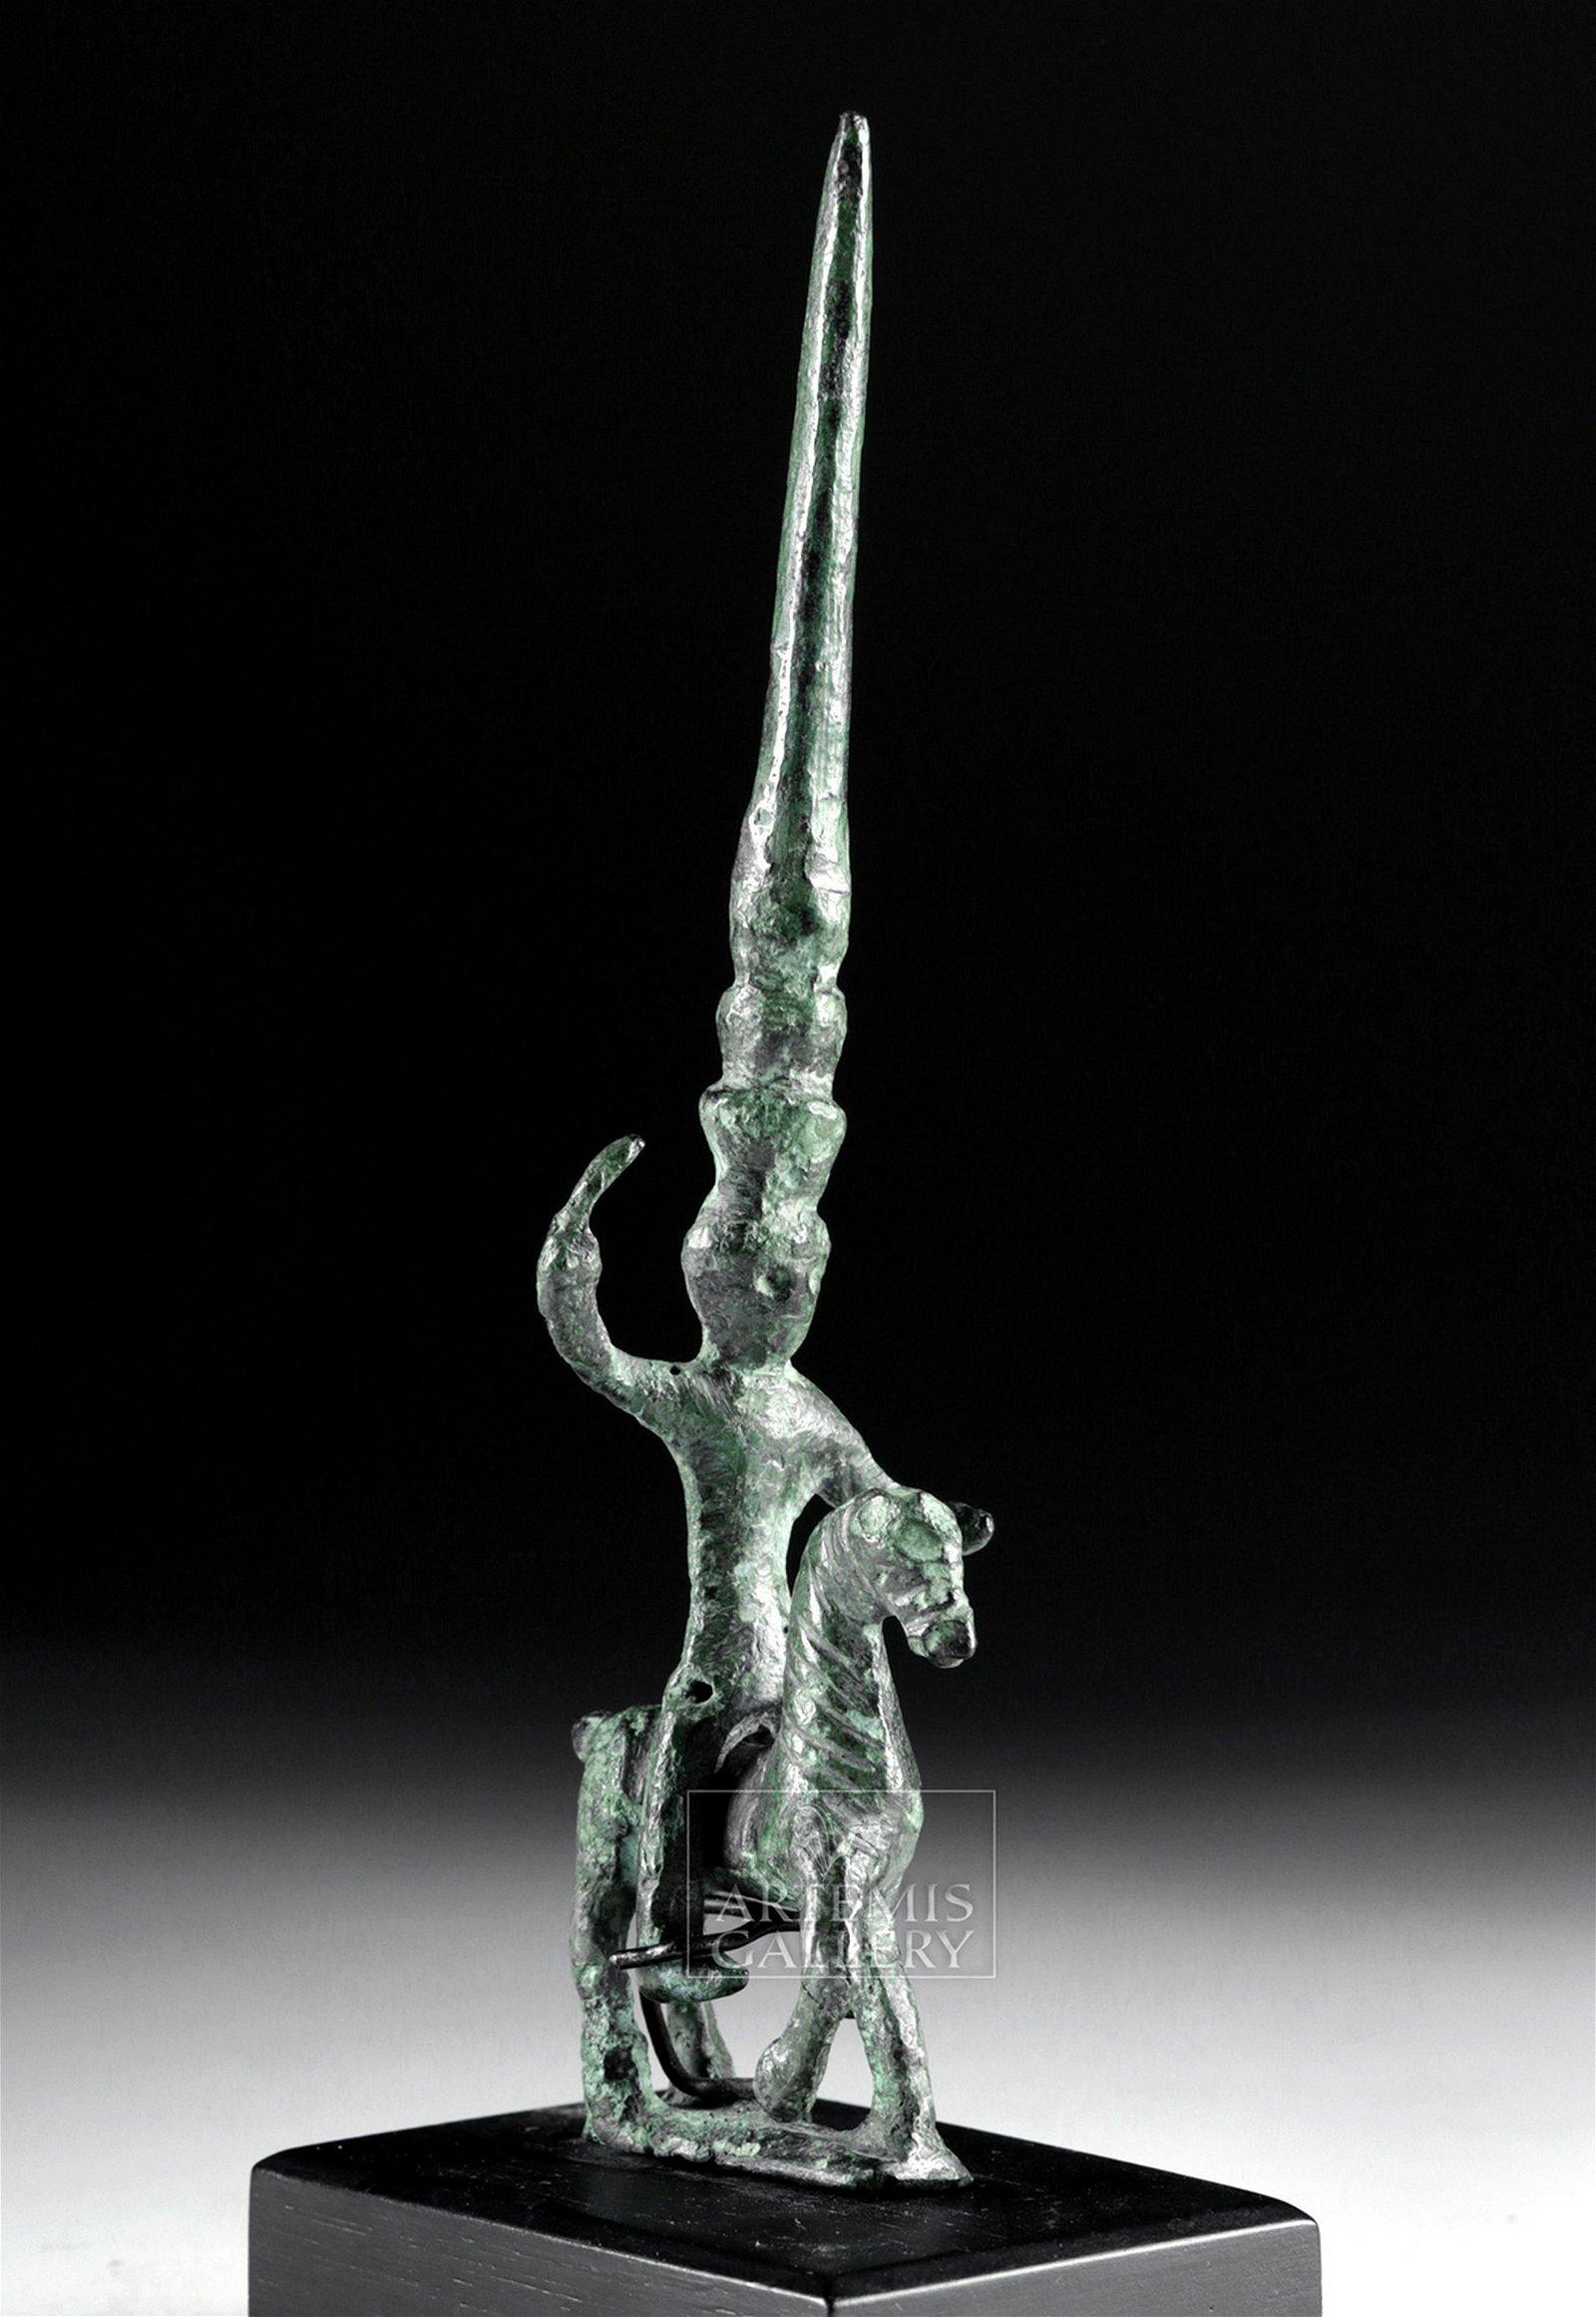 Exhibited Anatolian Hittite Bronze Horse and Rider